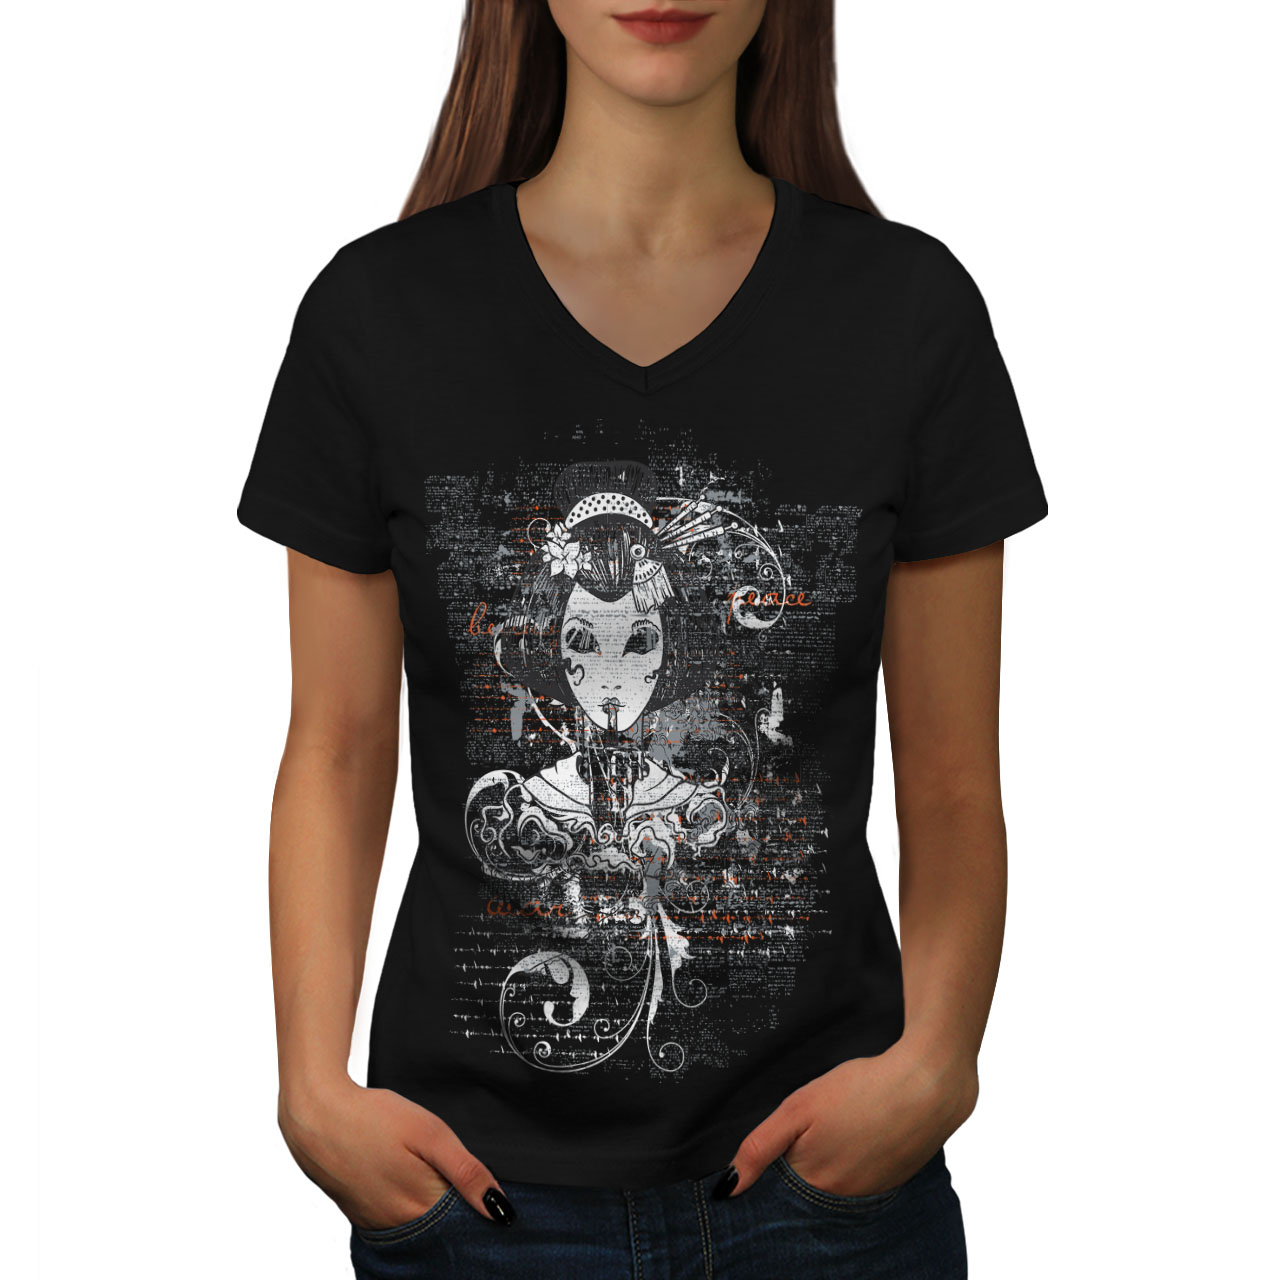 c1da5f07658d Wellcoda Gothic Asian Lady Womens V-Neck T-shirt, Girl Graphic ...